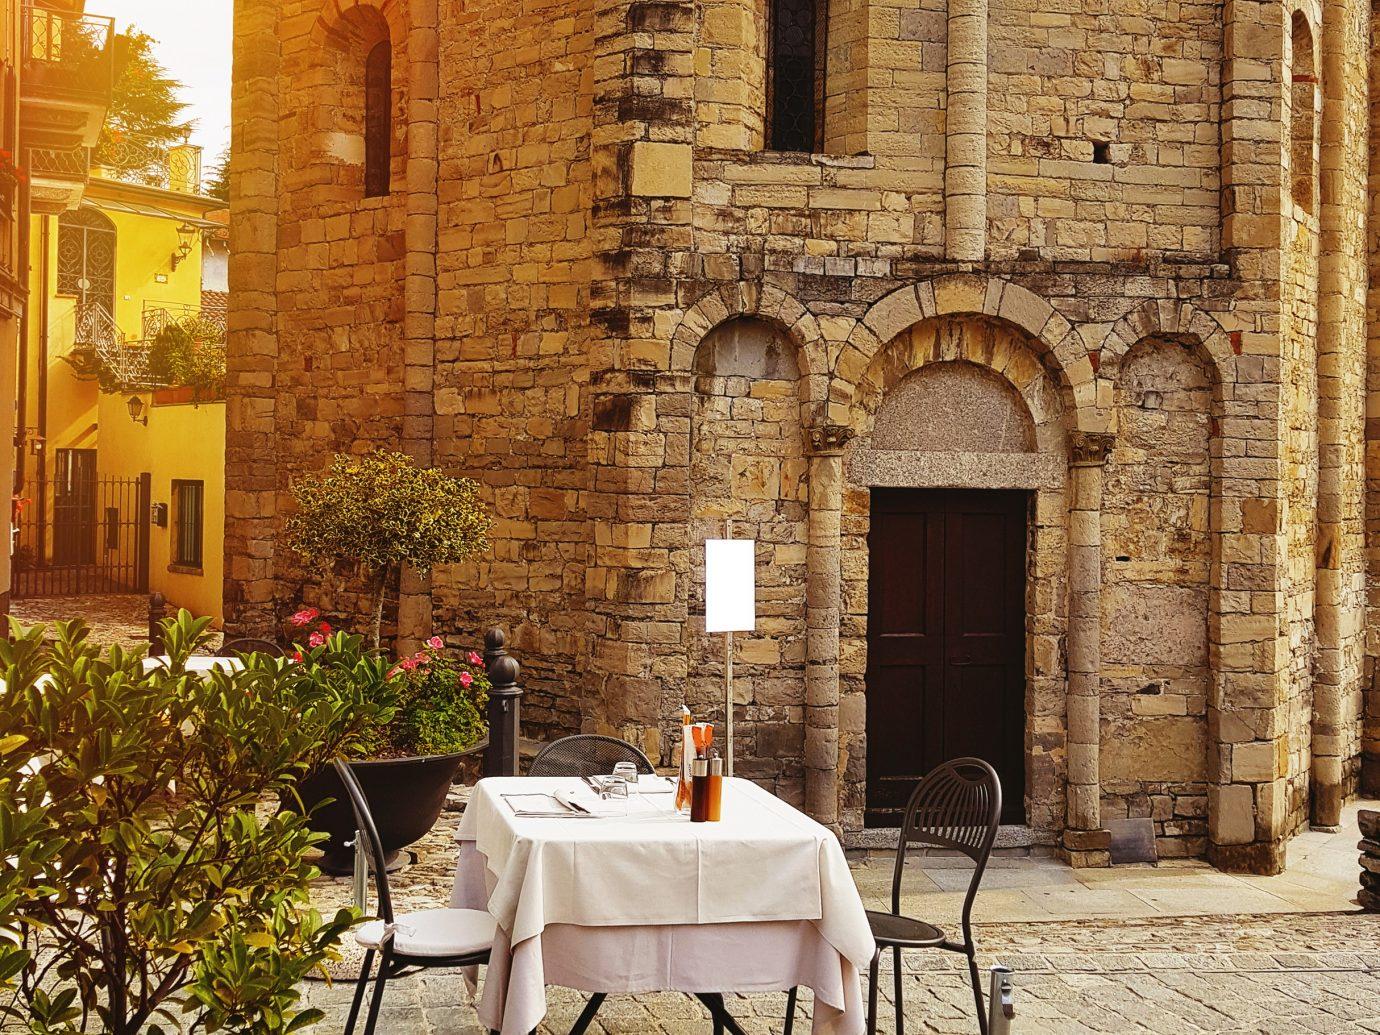 Small outdoor cafe in Genoa, Italy